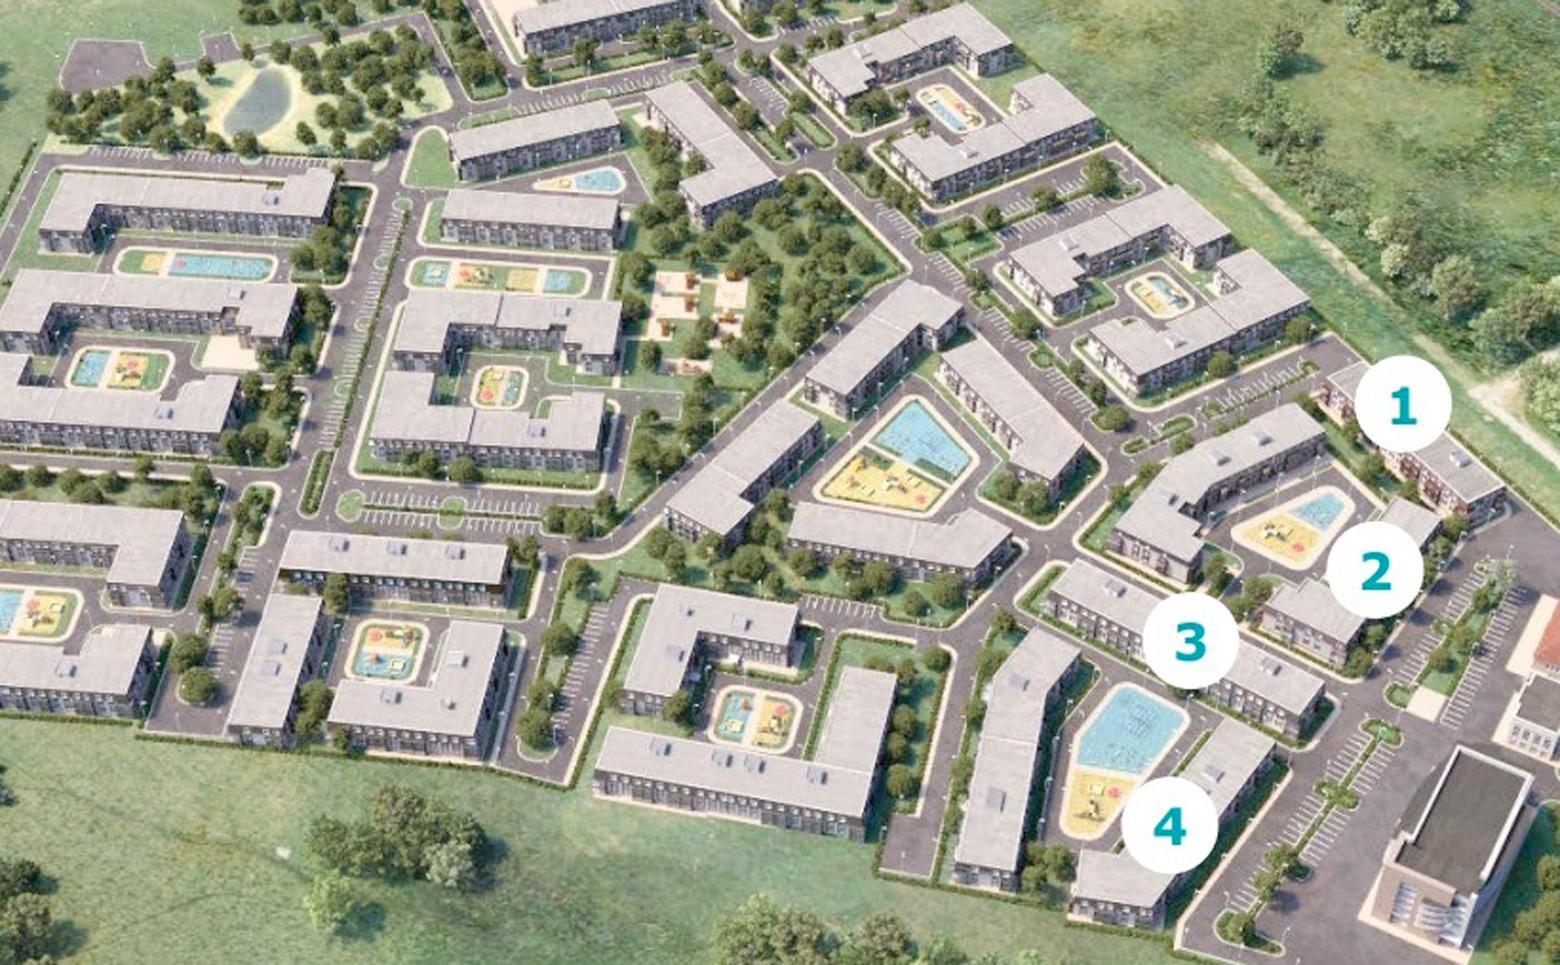 План жилого комплекса ЖК Ижора Сити